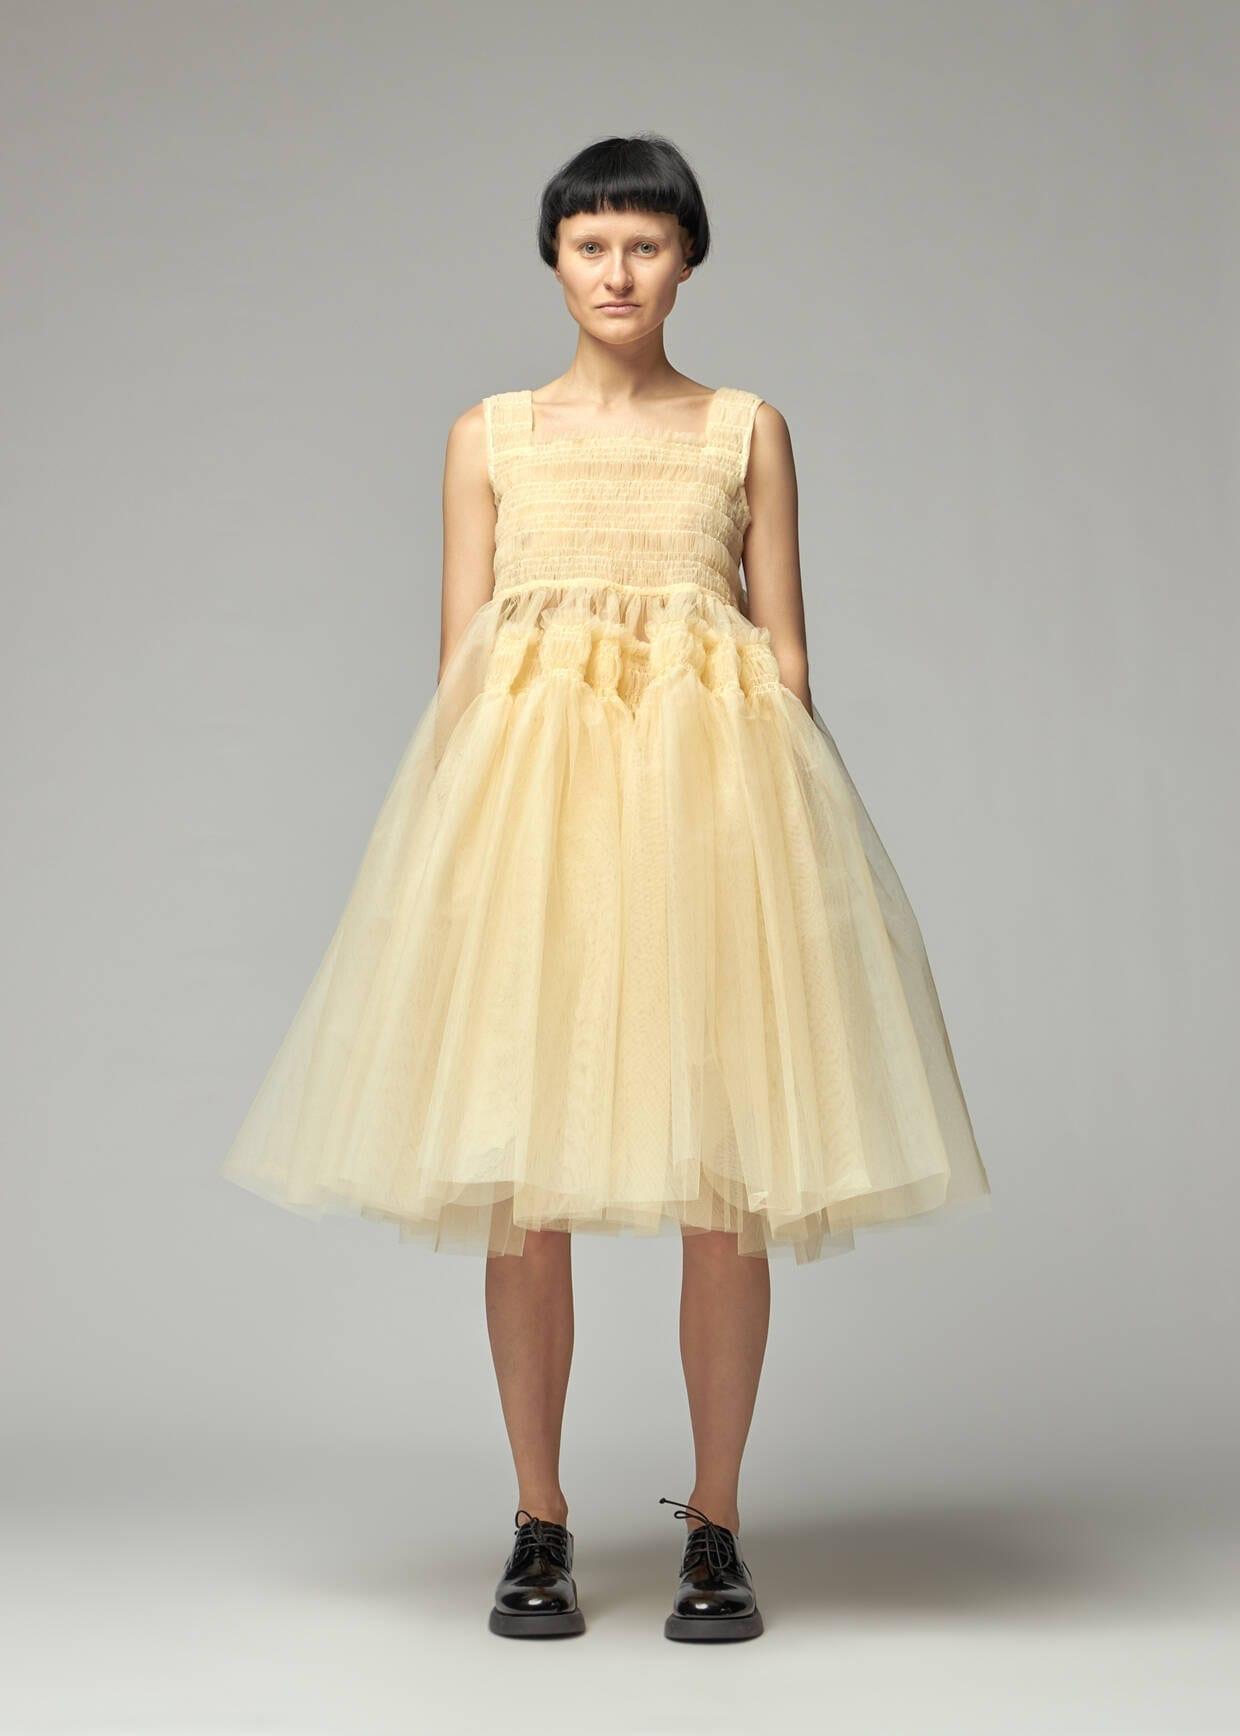 MOLLY GODDARD Jamila Smocked Stiff Tulle Sleeveless Dress